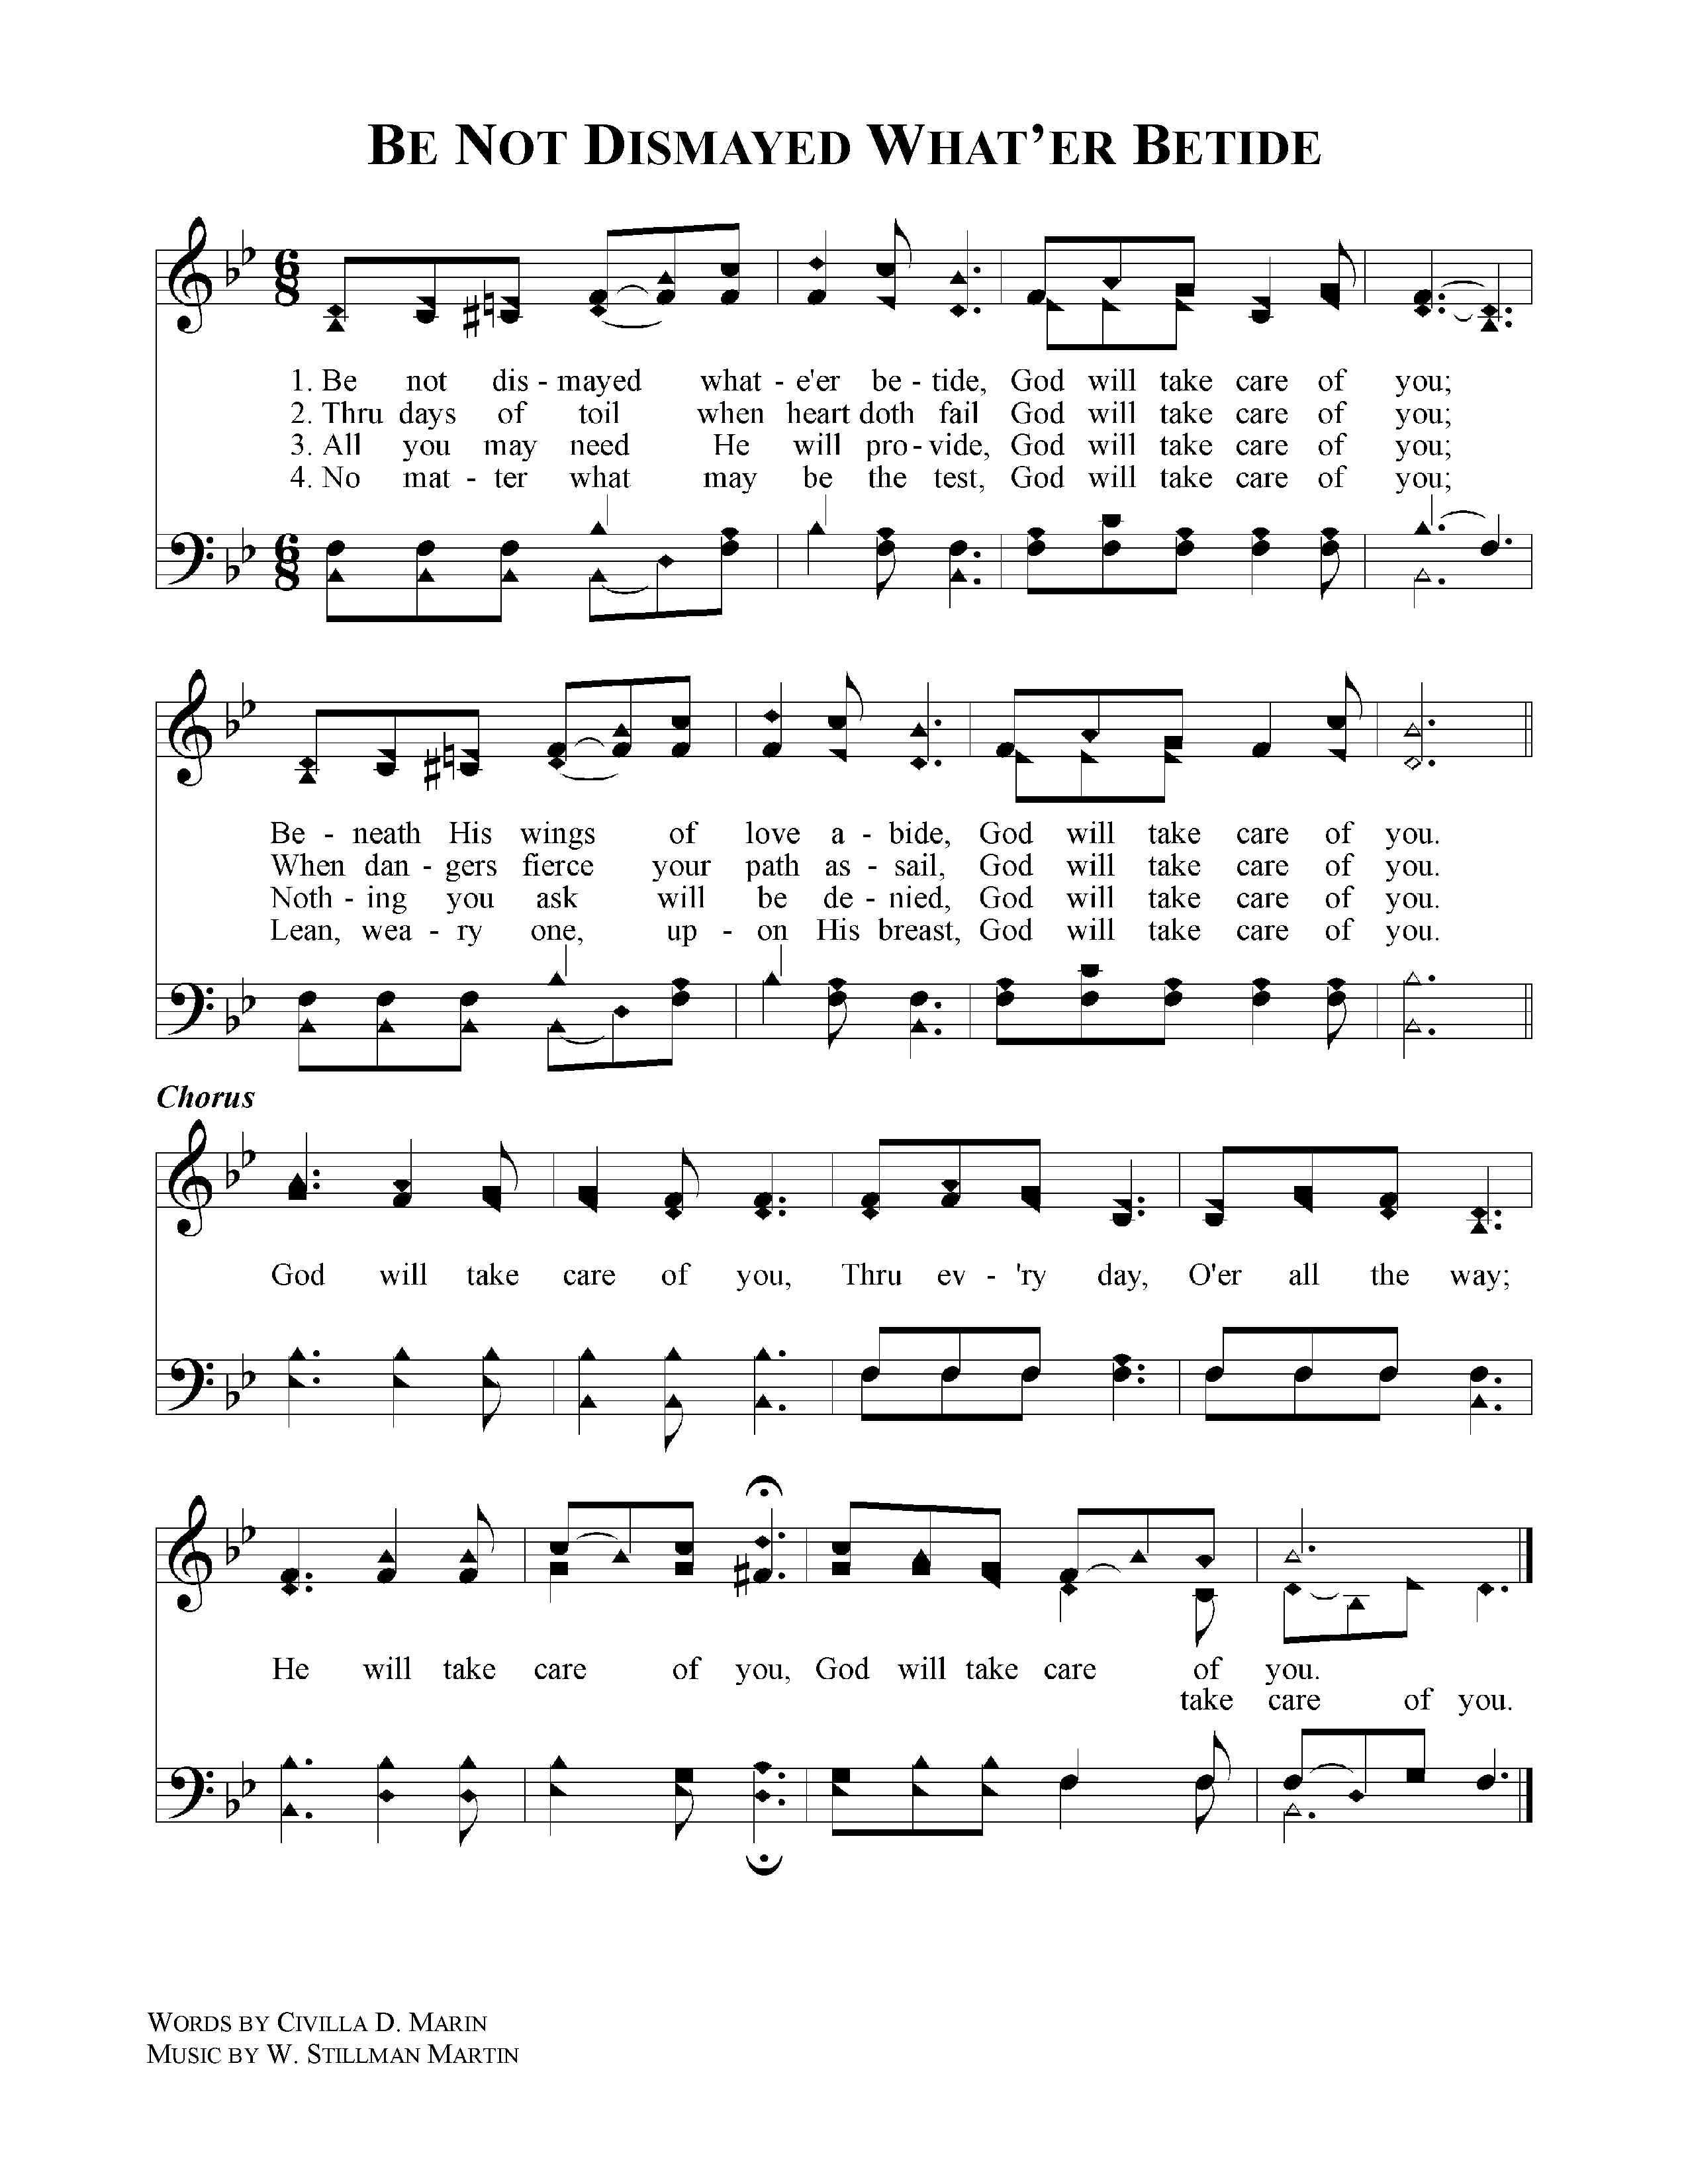 God will take care of you christian songs music lyrics